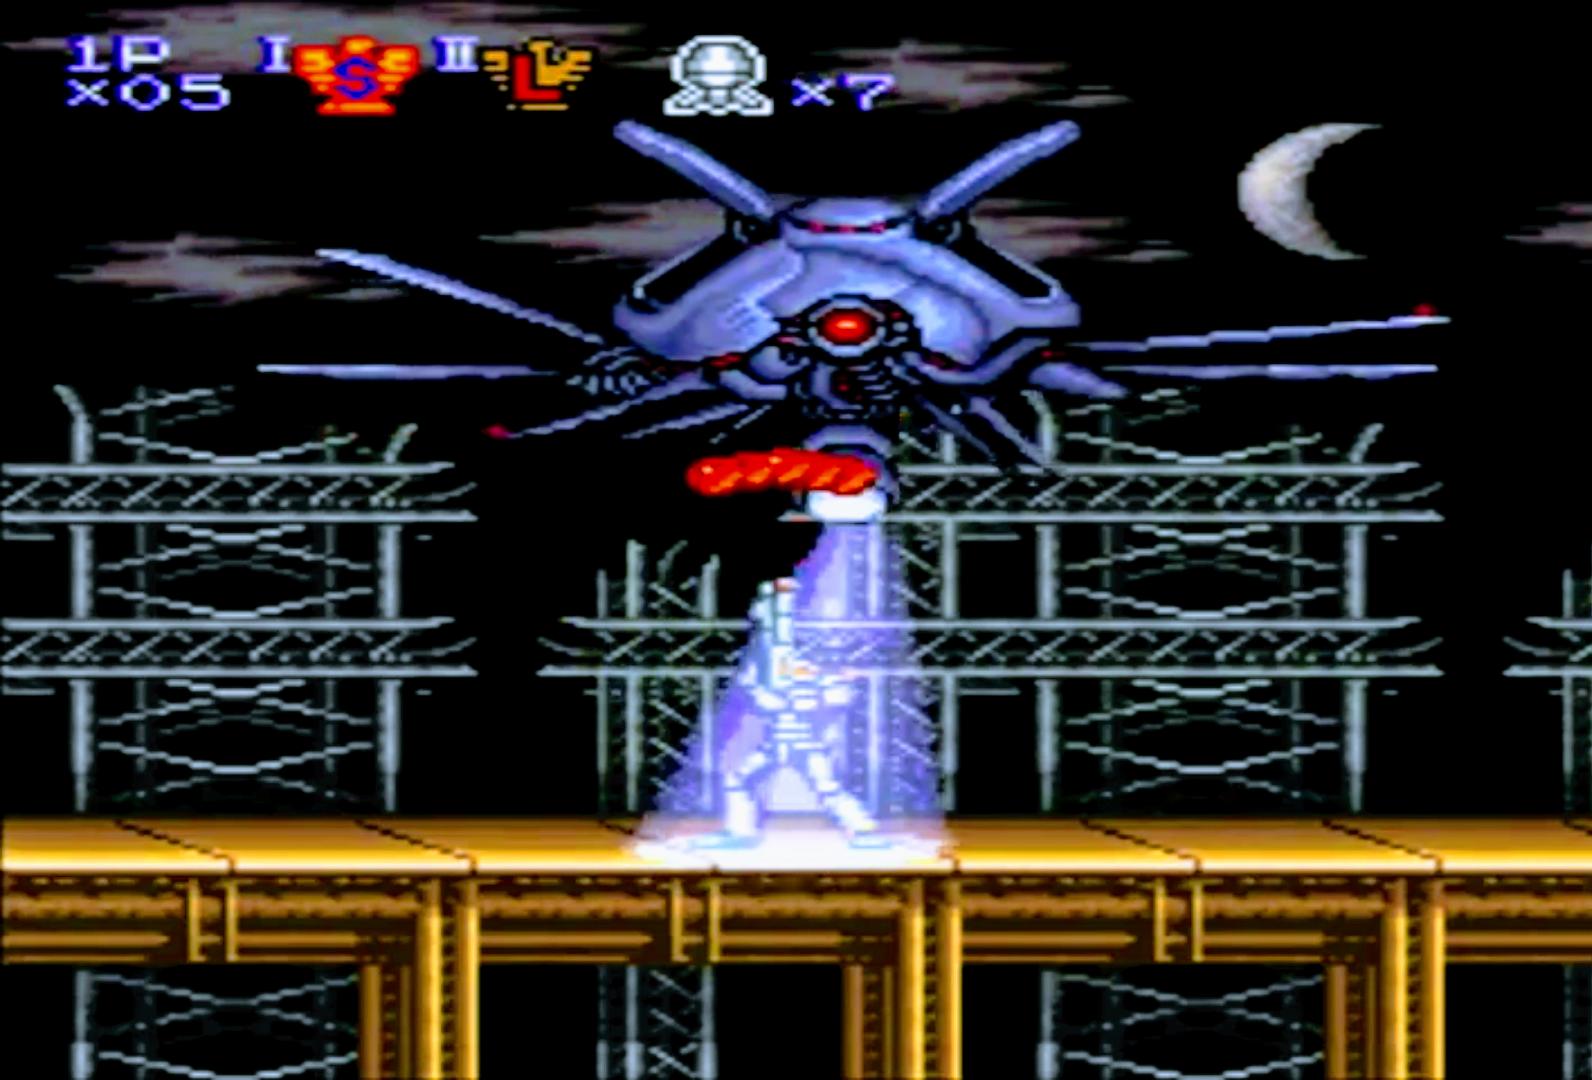 Nintendo SNES Classic Mini: Ende des Monats wieder vorbestellbar